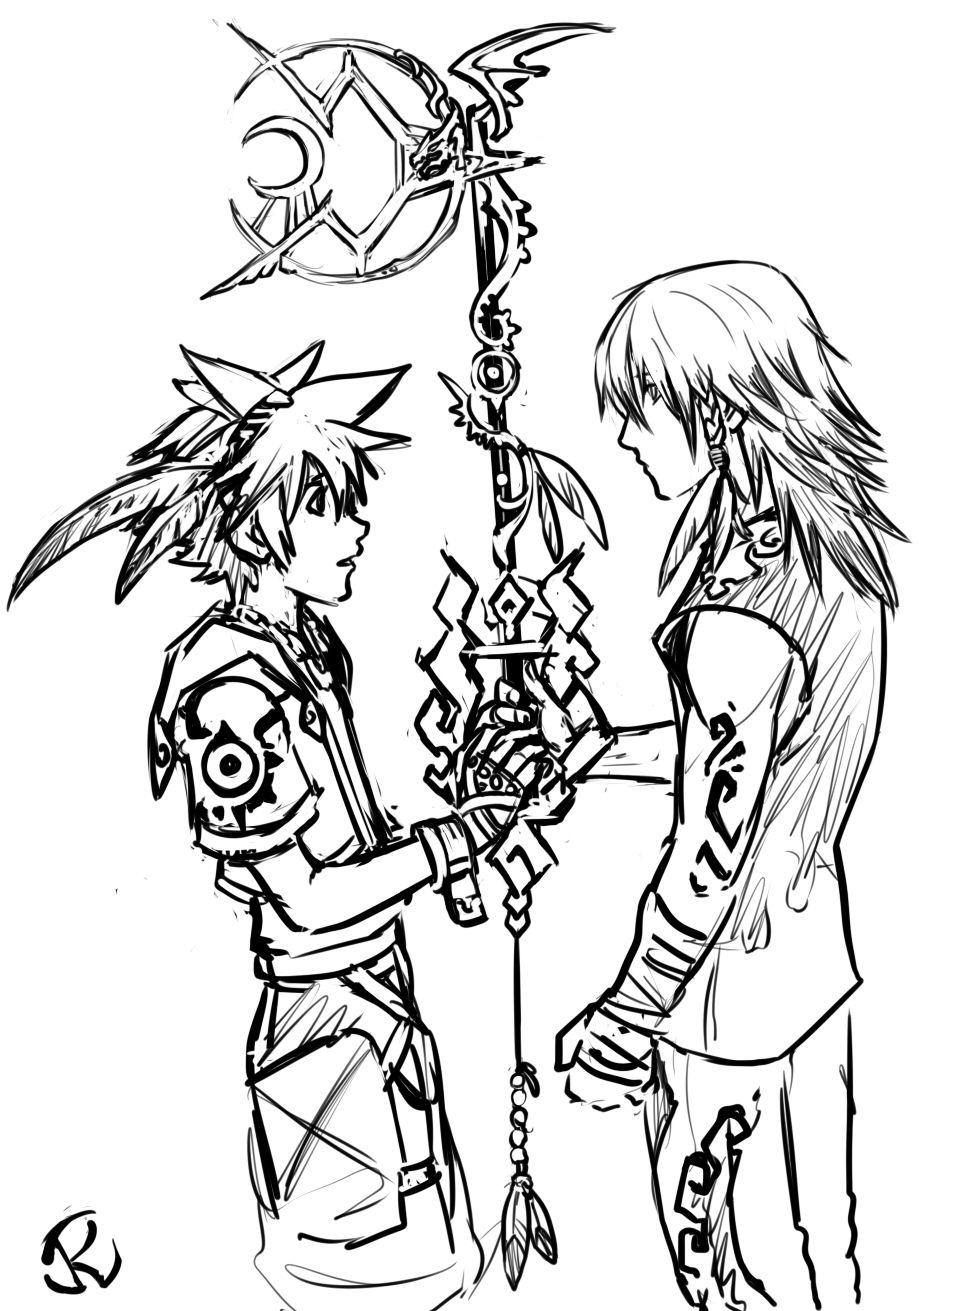 Tales of Zestiria meets Kingdom Hearts. Oh, look, some Sora ...